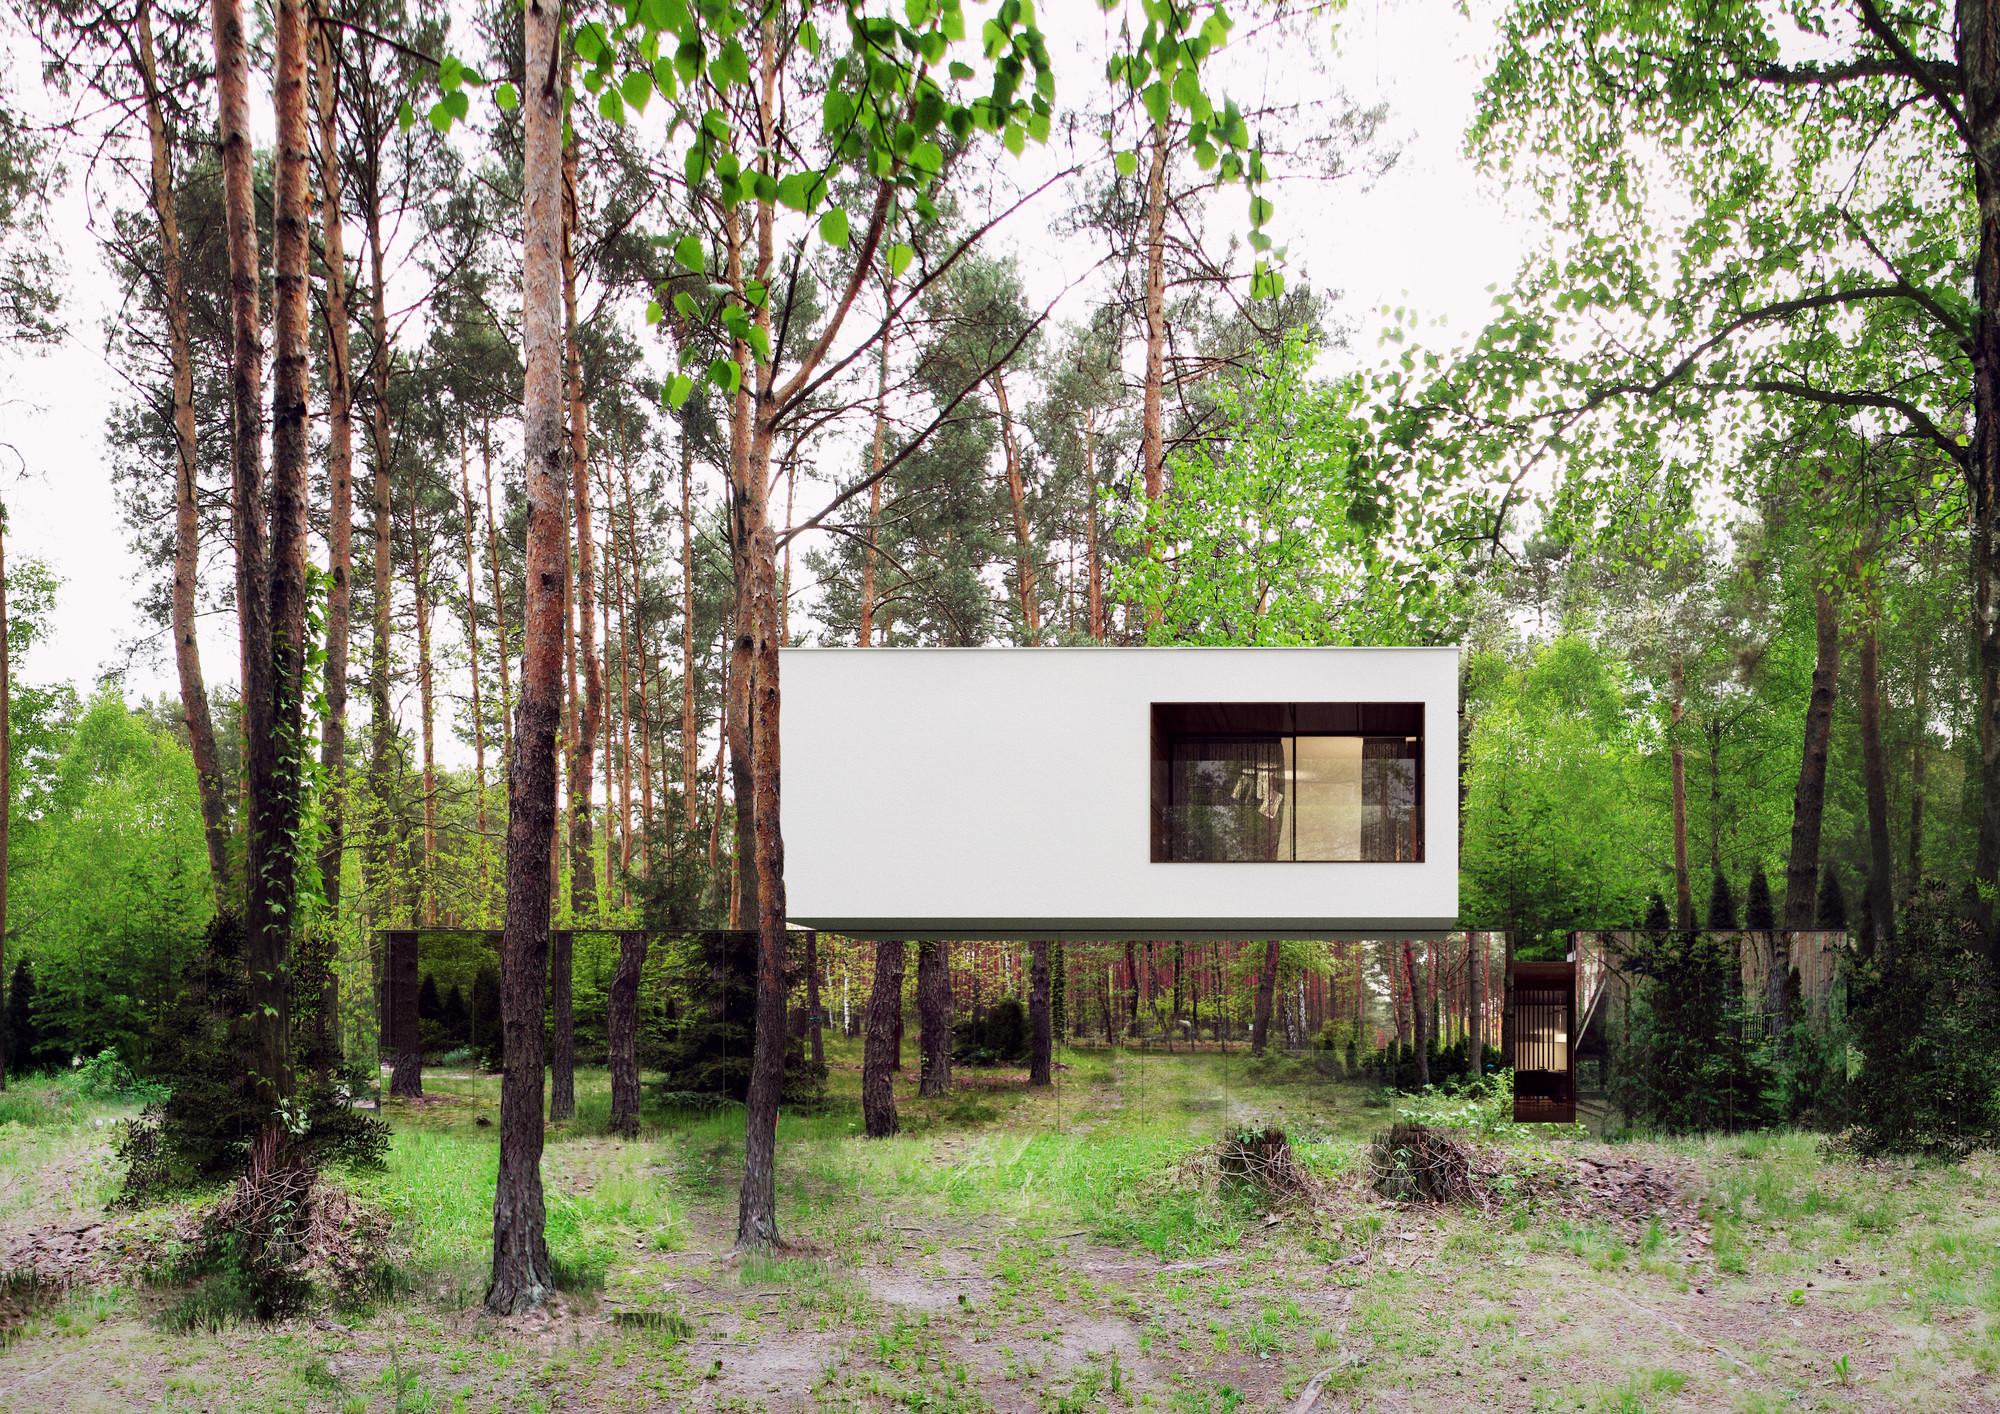 Casa Izabelin / REFORM Architekt, © Marcin Tomaszewski